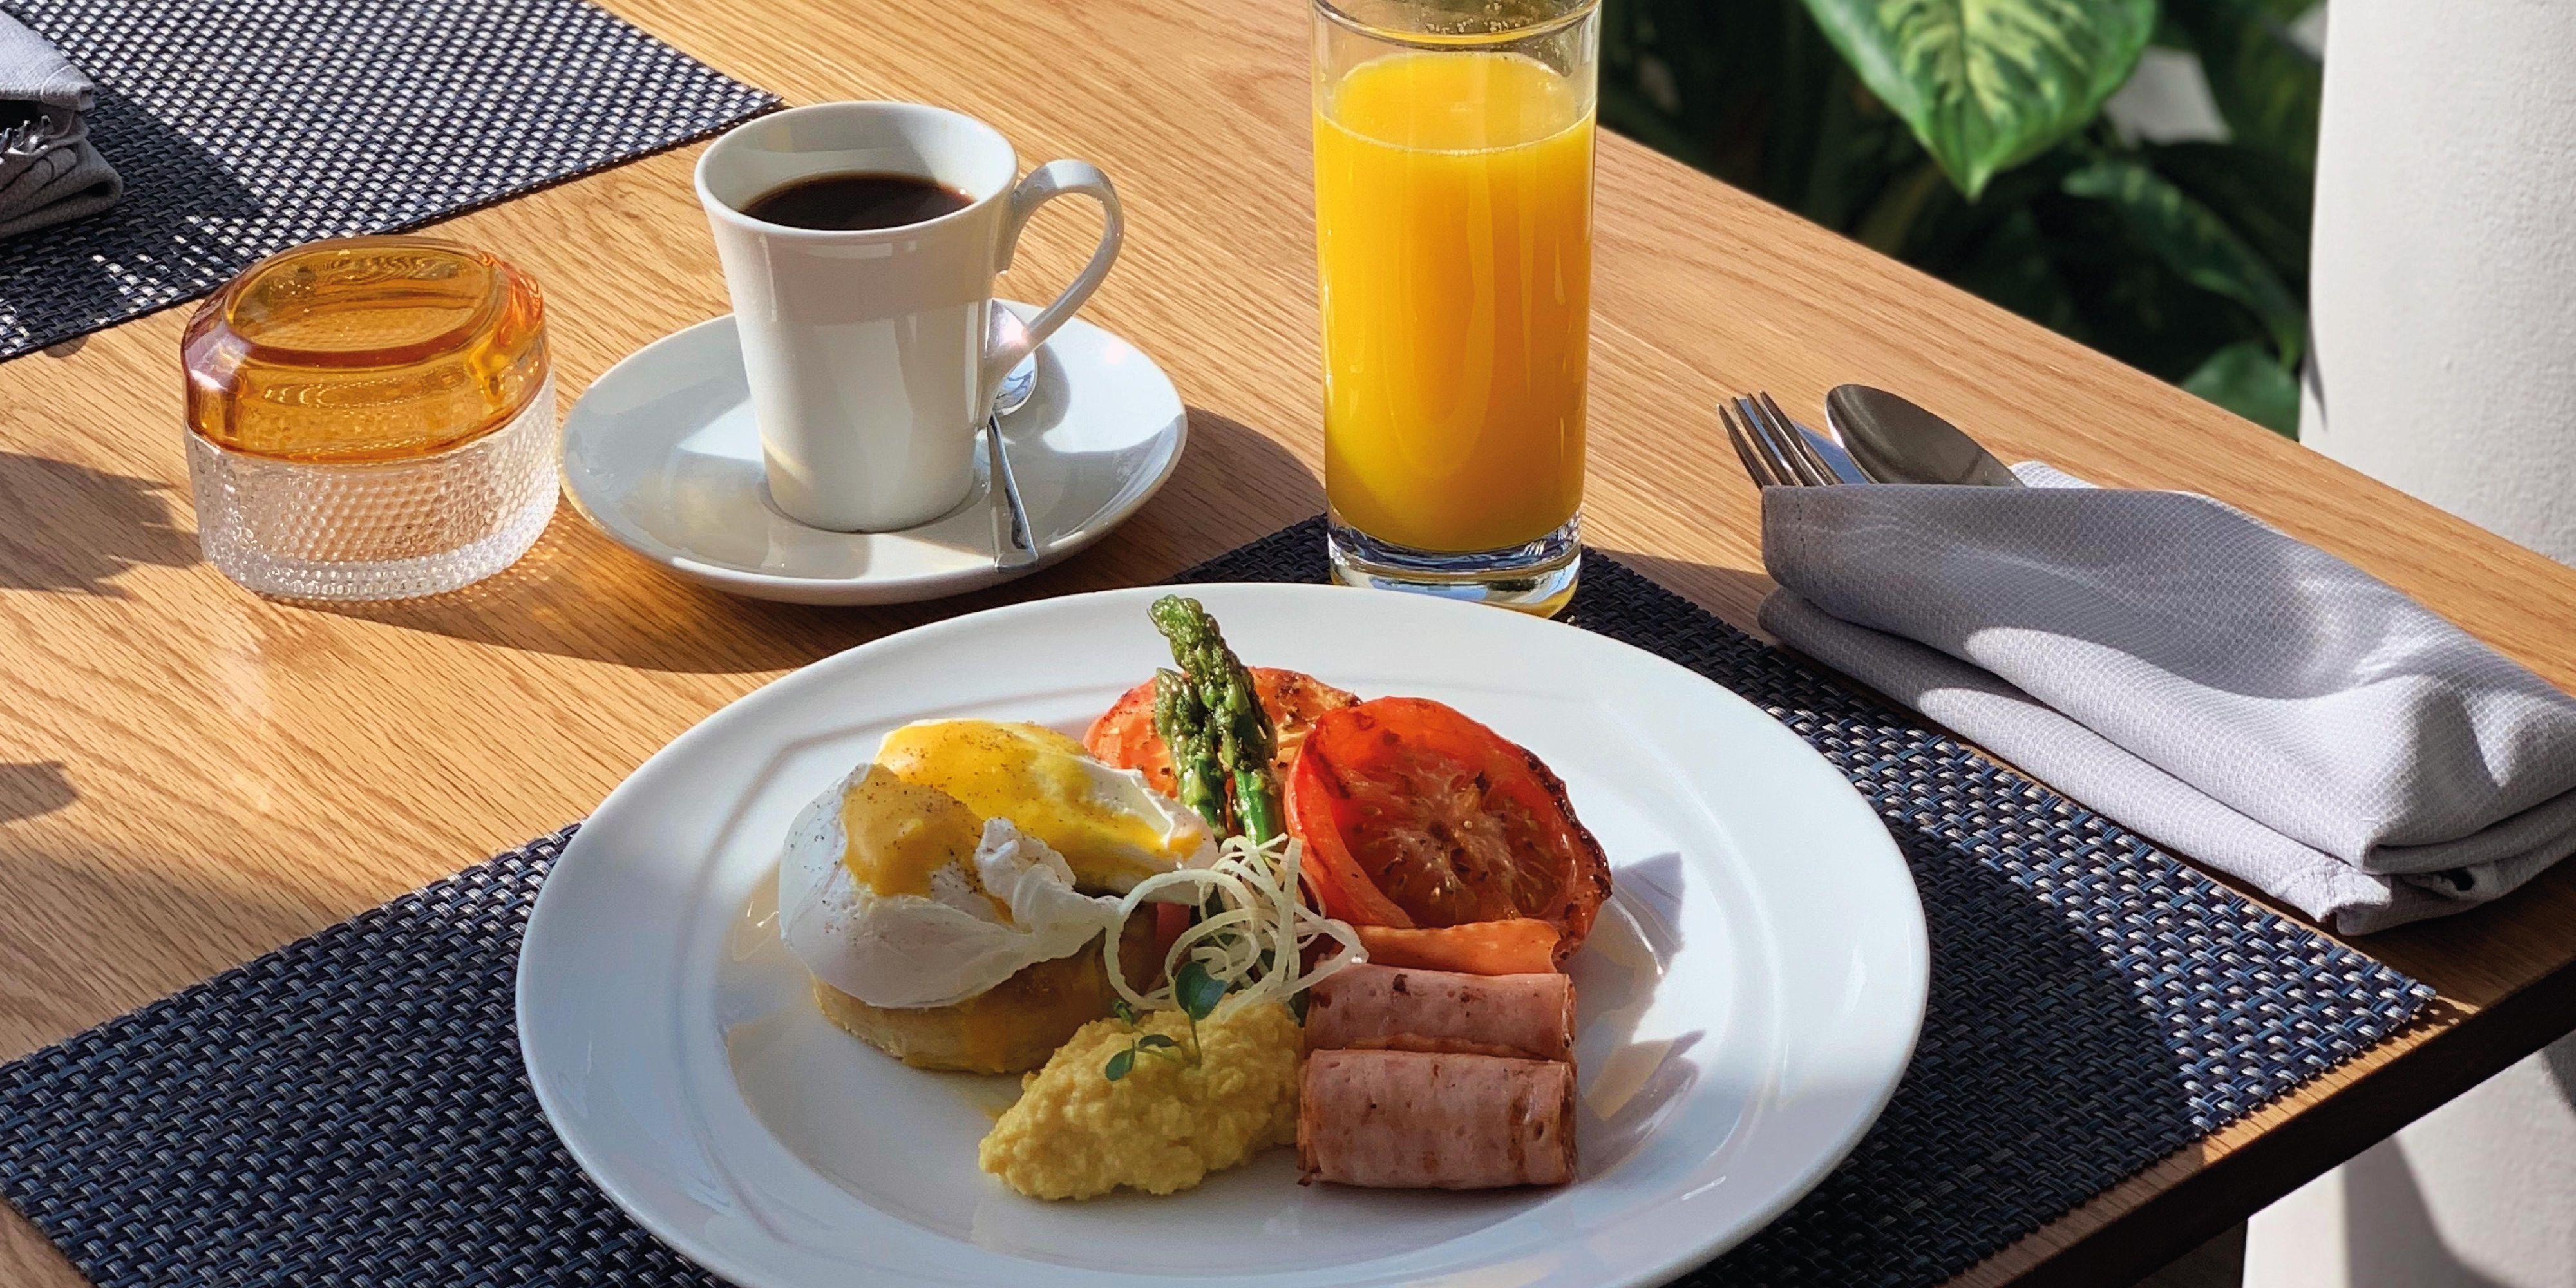 Celsius Restaurant, voco Dubai, Sheikh Zayed Road. Breakfast